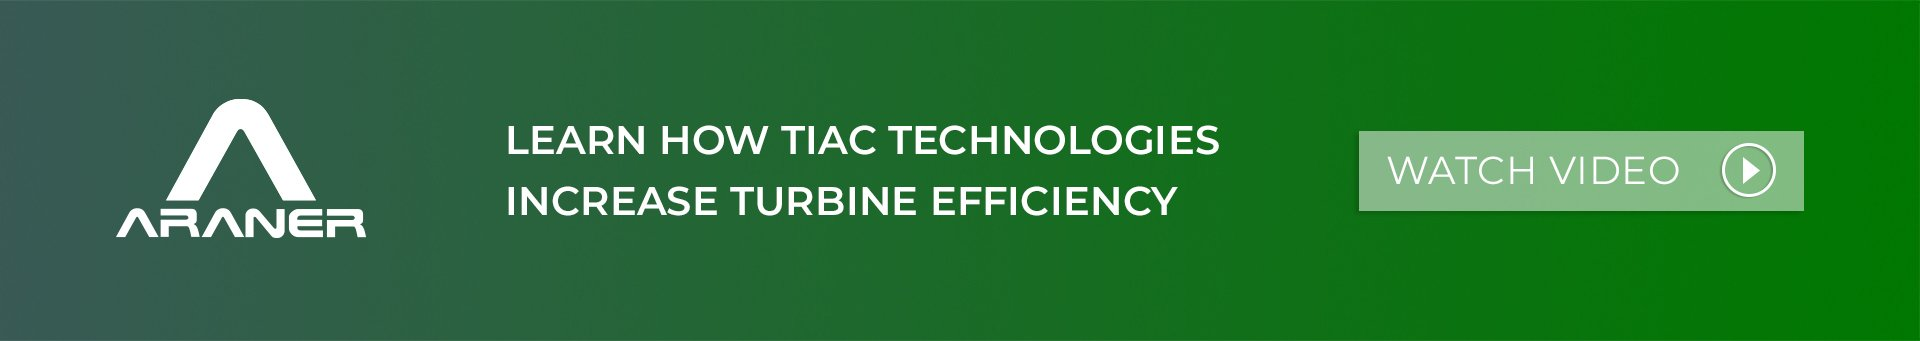 TIAC technologies increase turbine efficiency